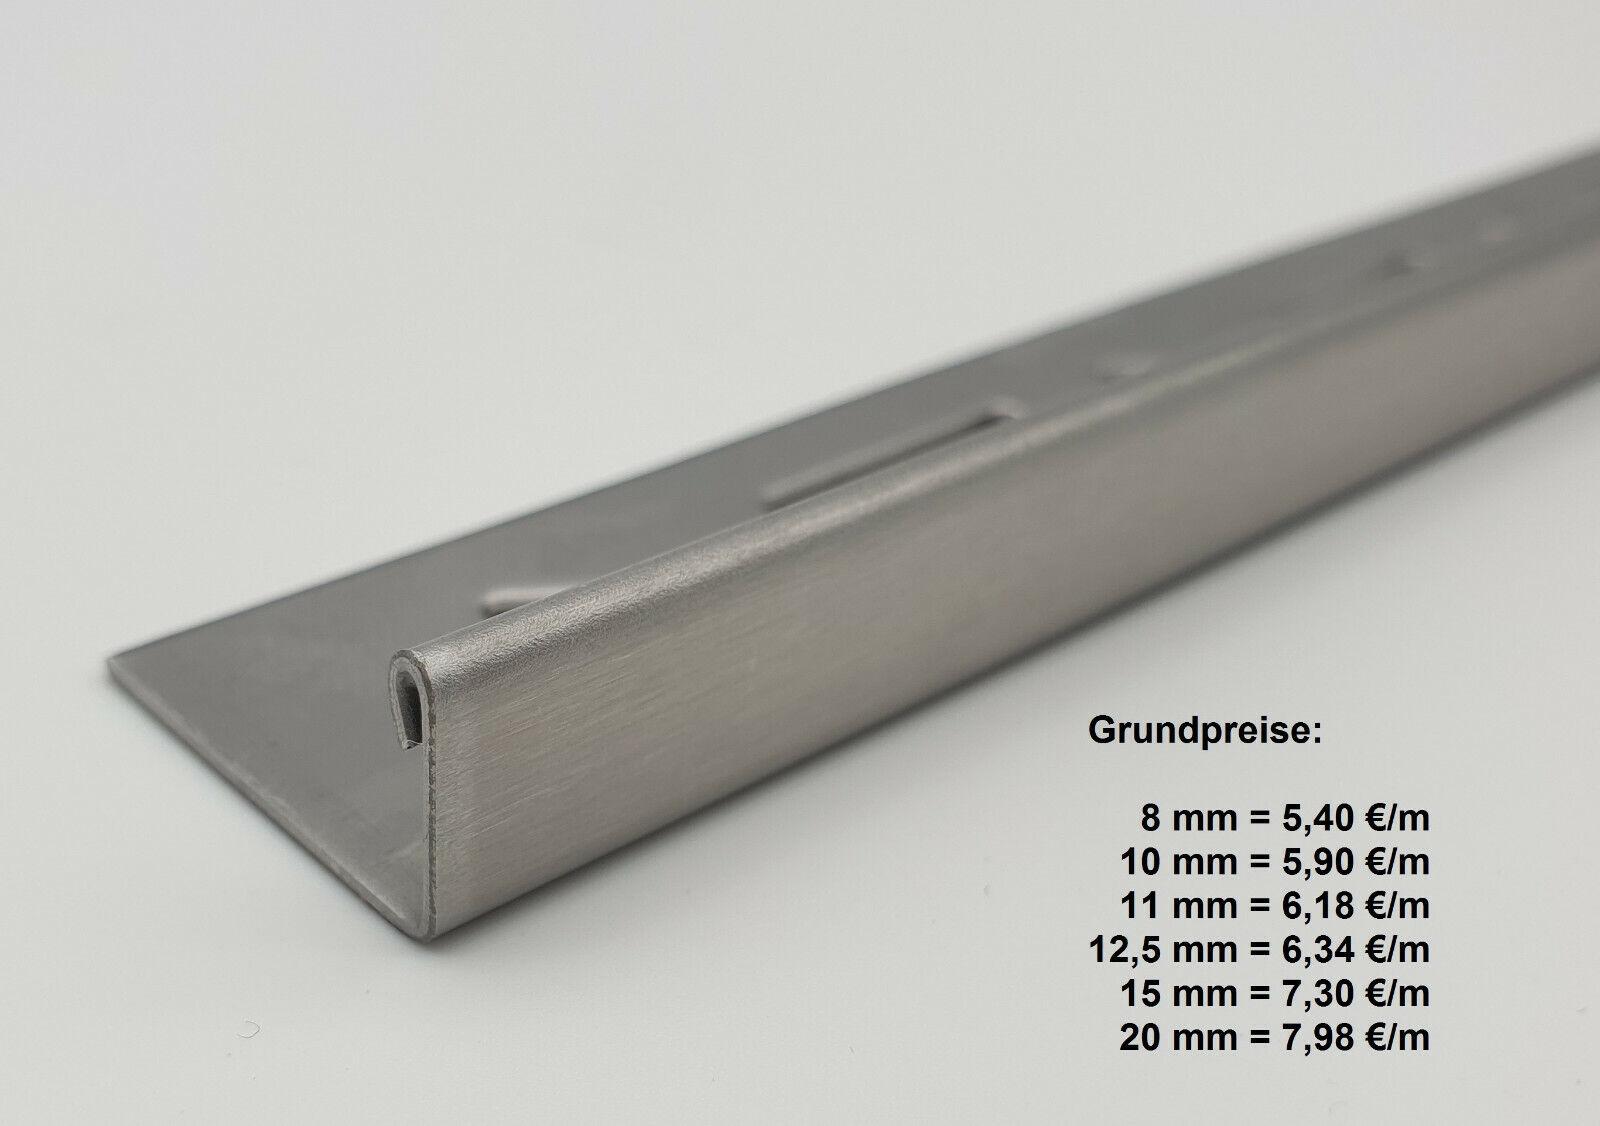 Edelstahl U-Profil gebürstet Korn 320 Innen Maß axcxb 15x15x15 mm  1.4301 V2A